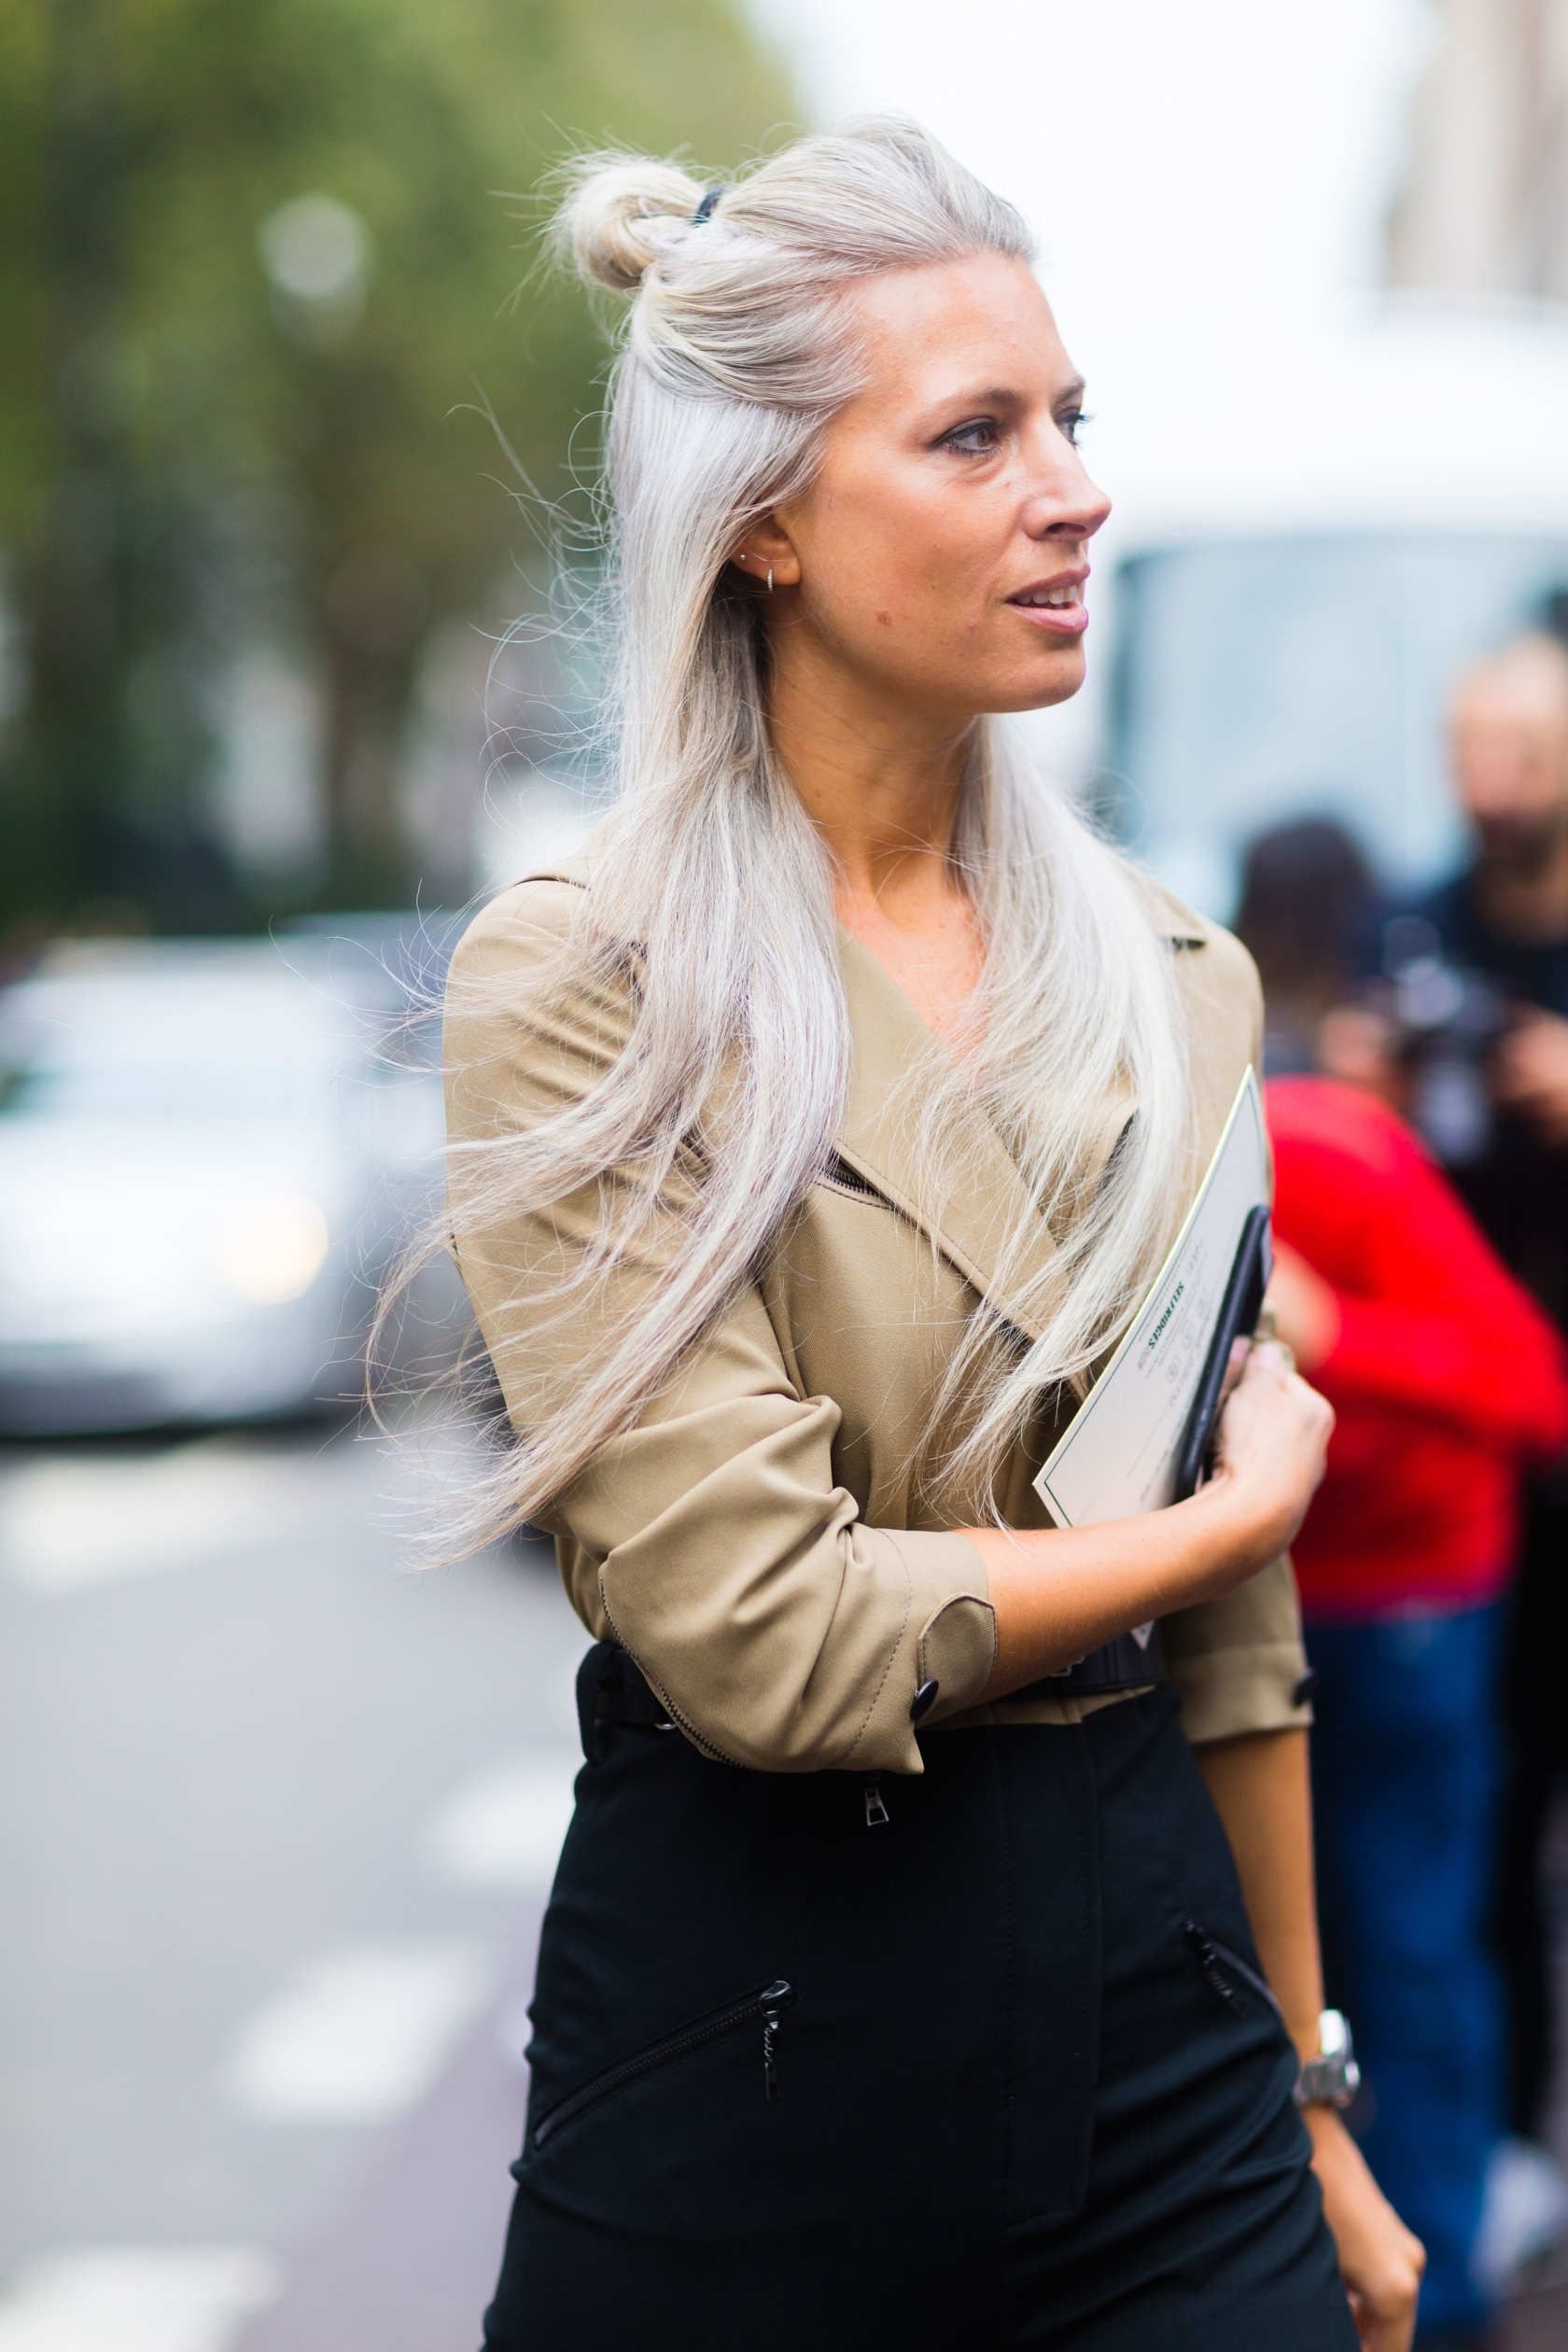 Sarah Harris   Sarah harris, Gray hair and Street styles